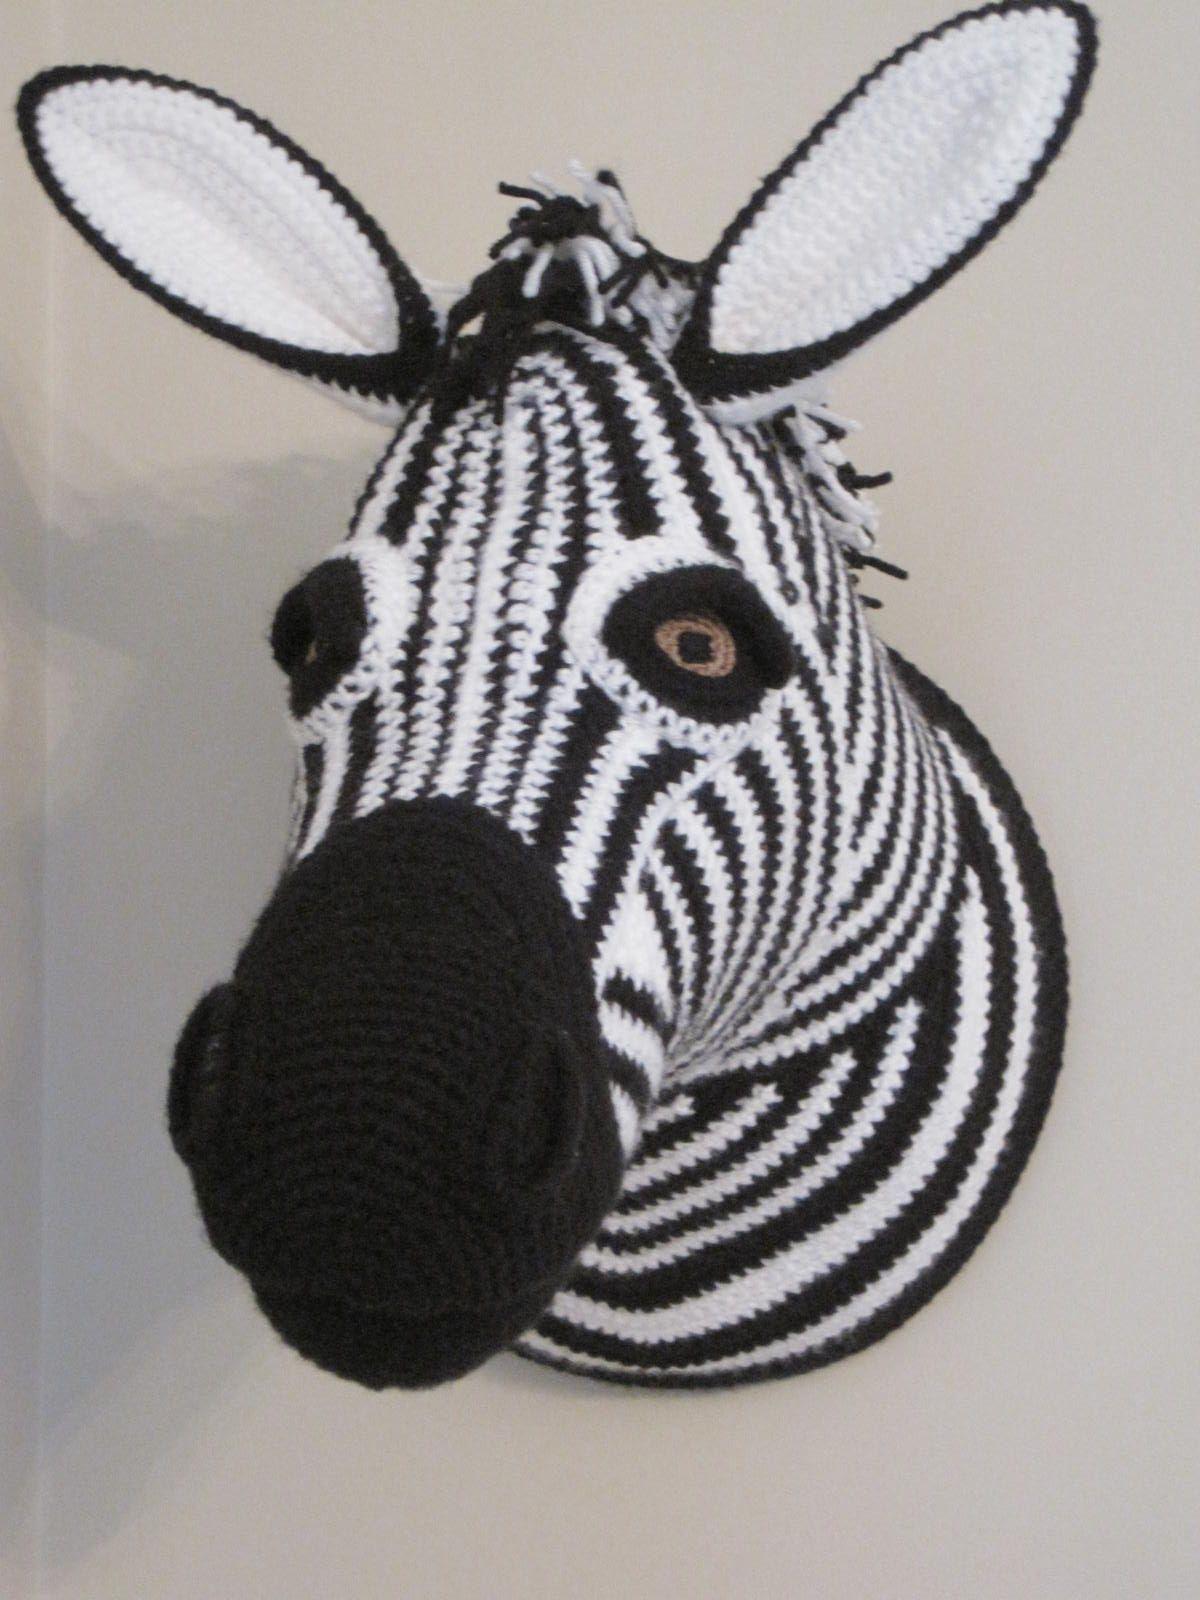 Crochet Taxidermy Zebra Pattern From Animal Heads By Vanessa Mooncie